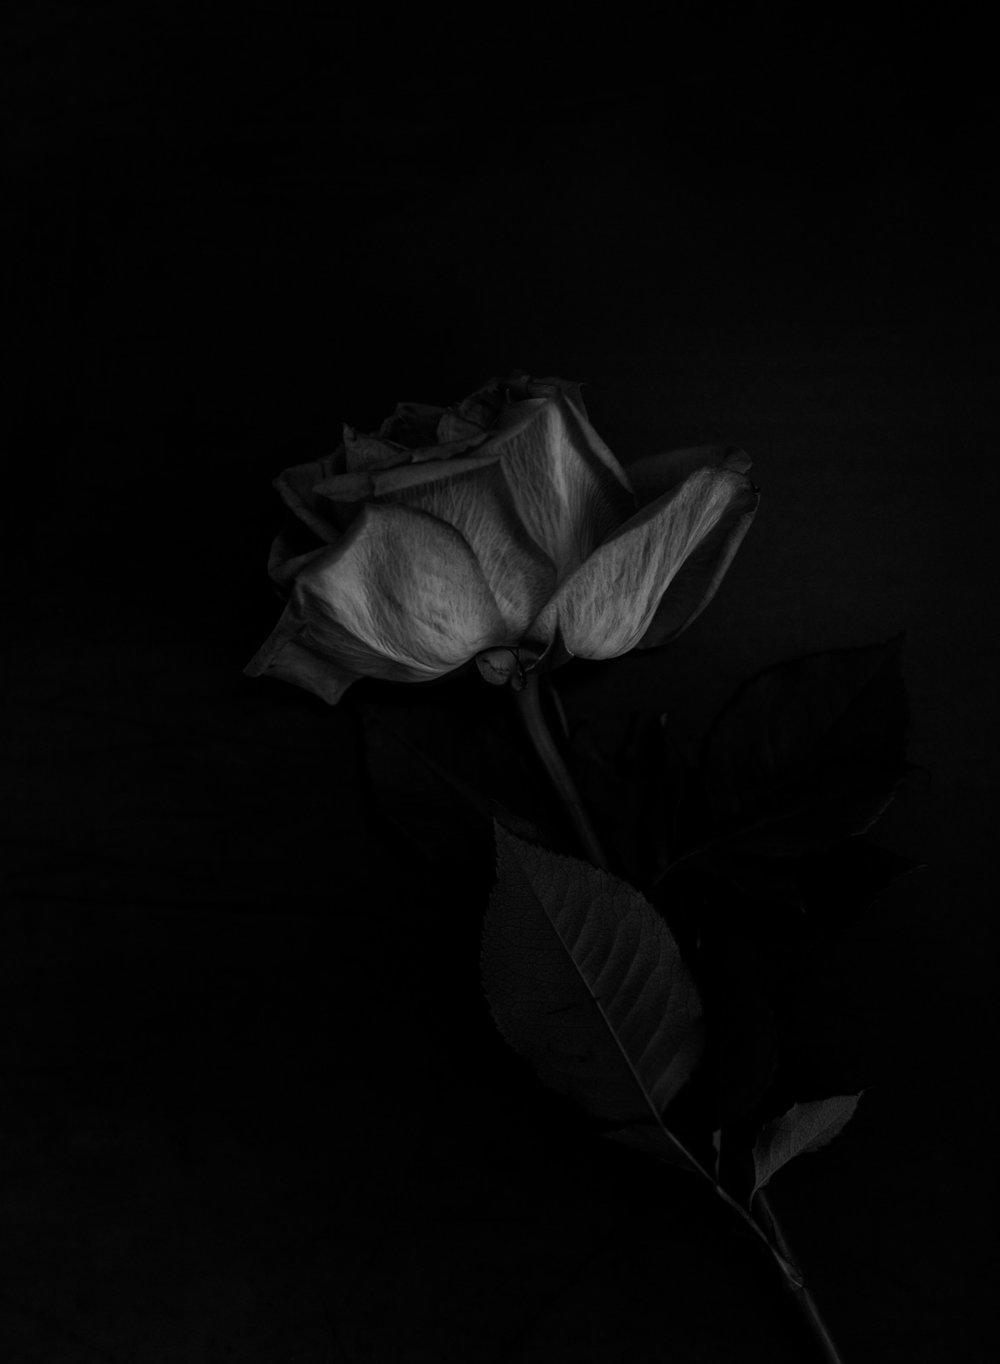 Roses30MINUTES-12.jpg